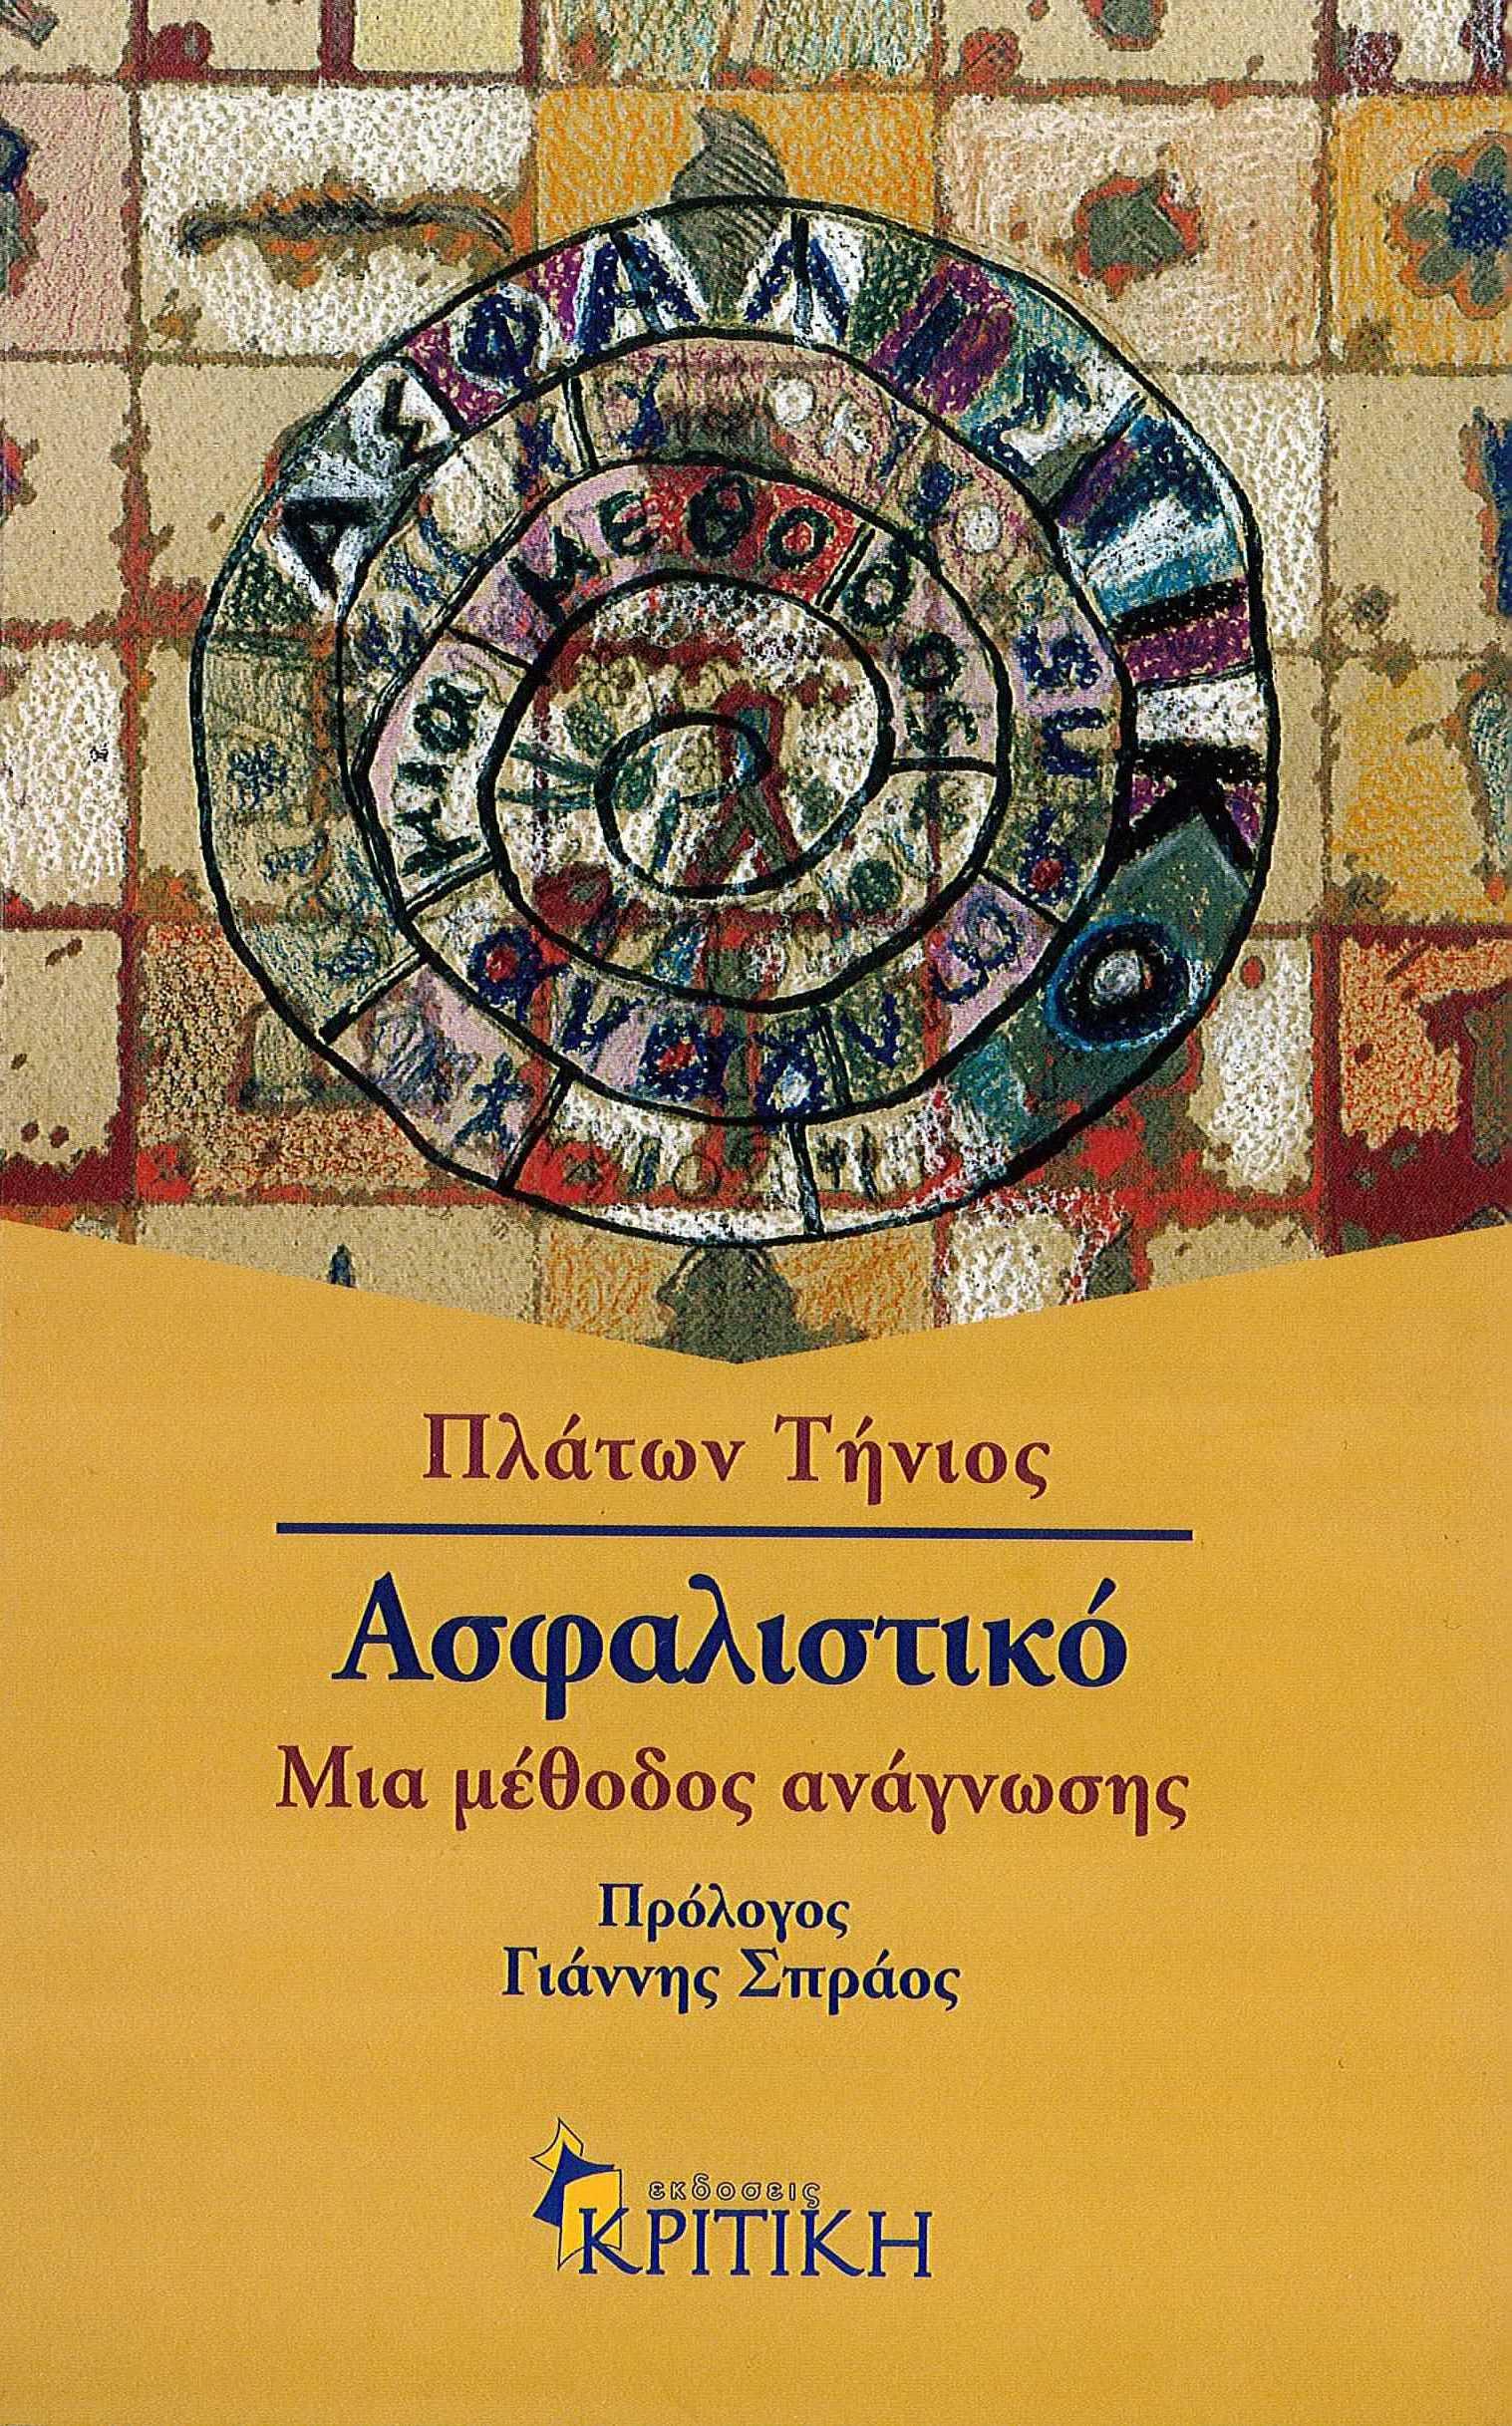 "<strong>ΑΣΦΑΛΙΣΤΙΚΟ</strong><br/>Μια μέθοδος ανάγνωσης<br/>του Π. Τήνιου<br/>Εκδόσεις: Κριτική, τηλ. 210-8211811<br/>URL: <a href=""http://www.kritiki.gr"" target=""_blank"">www.kritiki.gr</a>)<br />Έτος Έκδοσης : 2010<br /><br />"